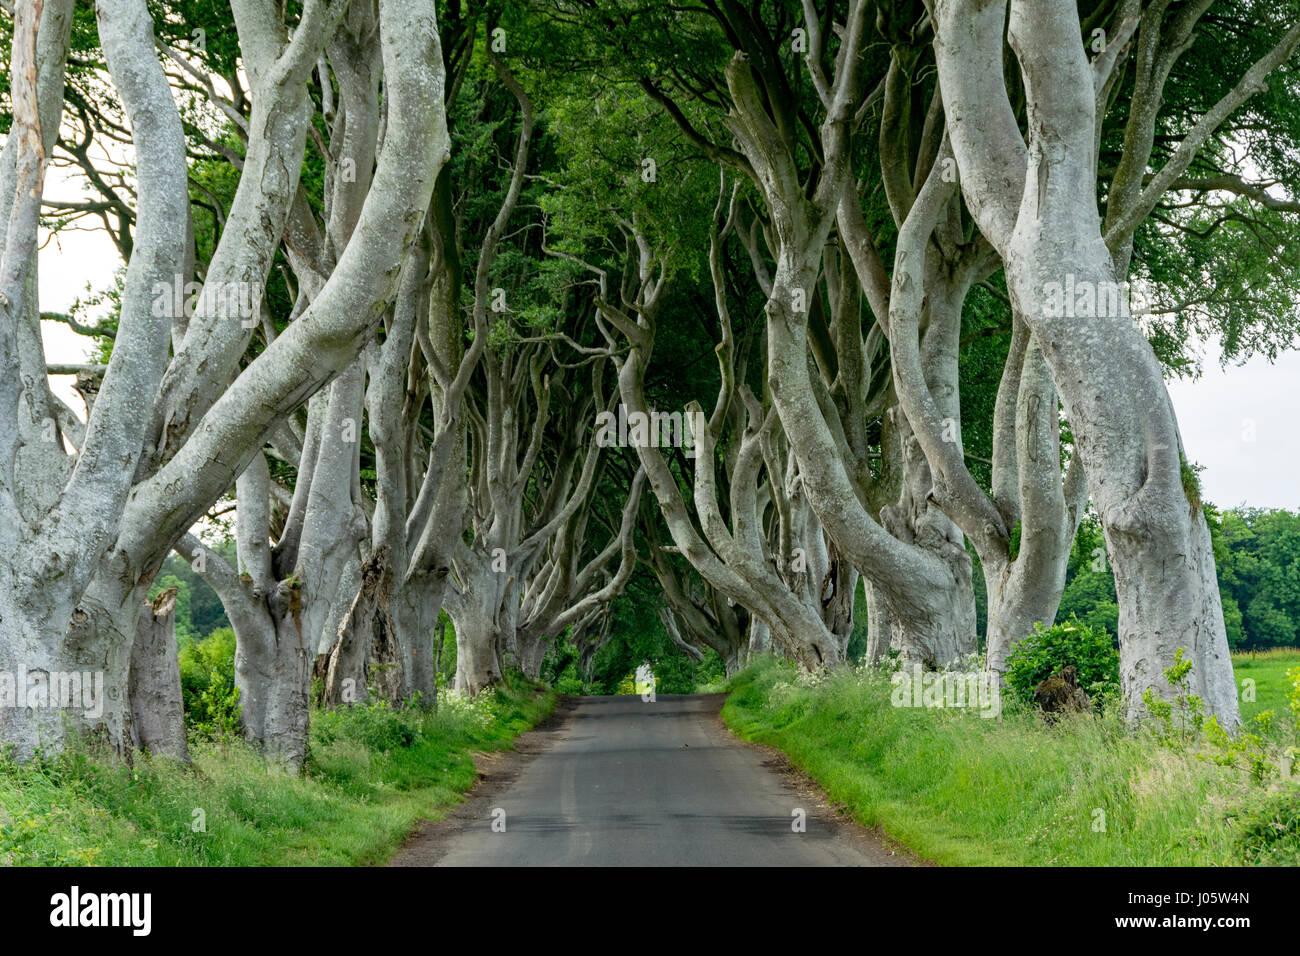 The Dark Hedges, near Armoy, County Antrim, Northern Ireland, UK - Stock Image